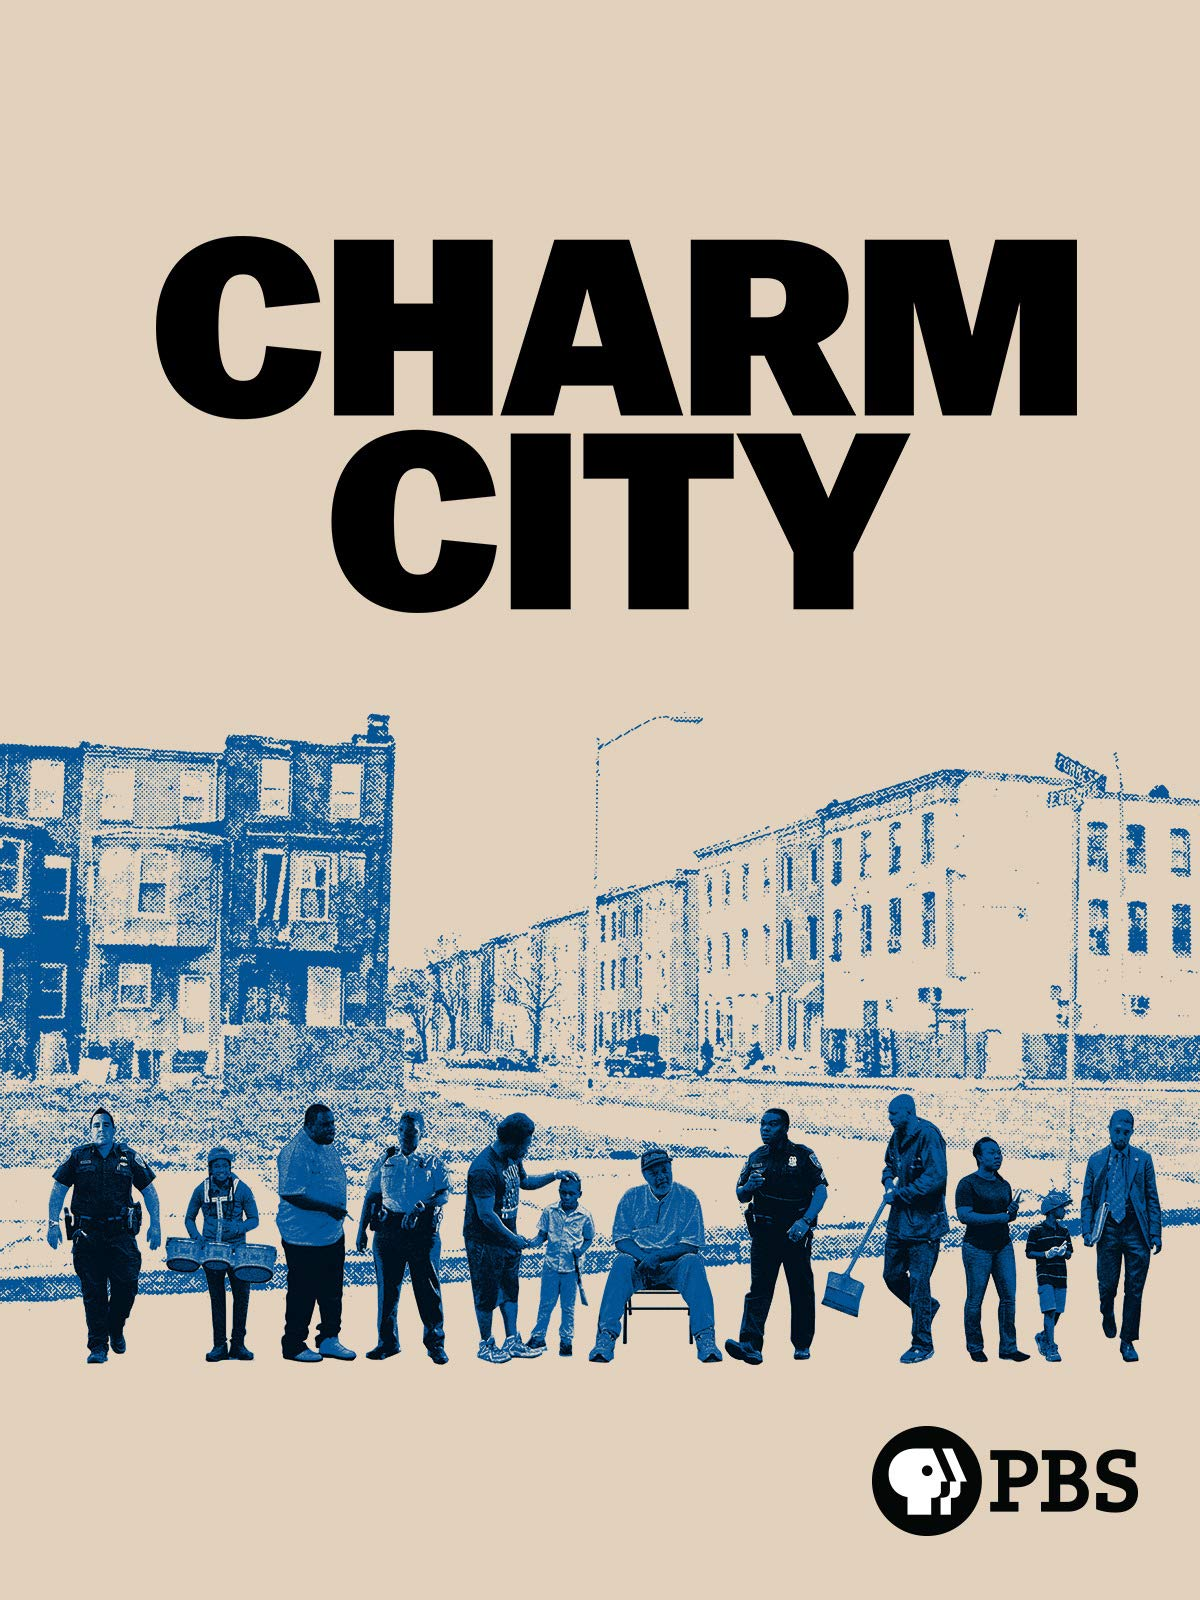 Watch Charm City Prime Video